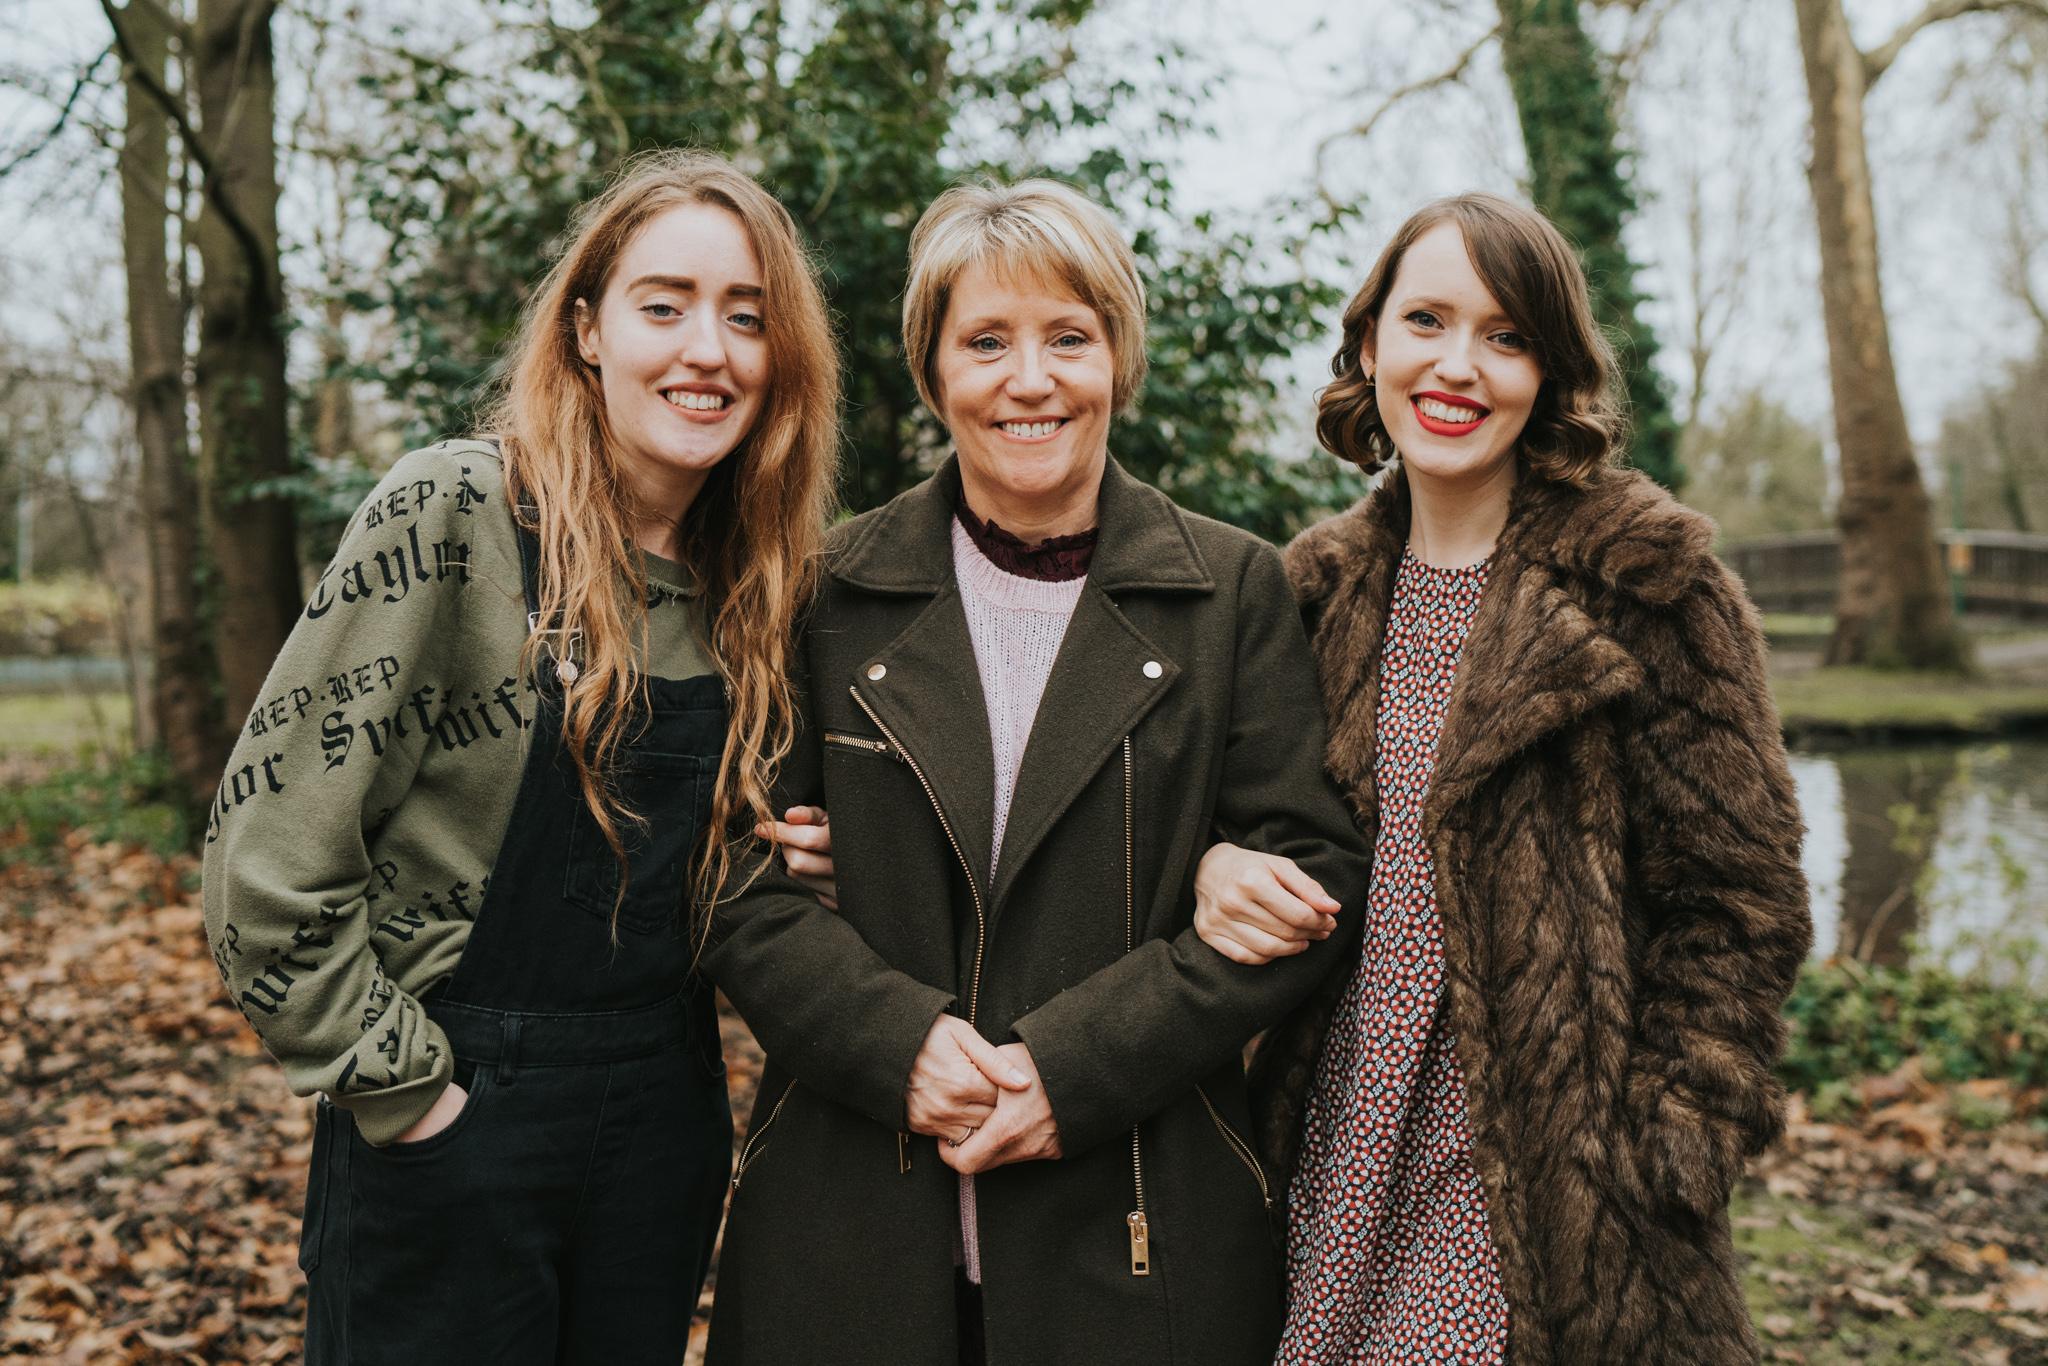 Hertfordshire-extended-family-session-grace-elizabeth-colchester-essex-alternative-wedding-photographer-suffolk-devon-norfolk (9 of 26).jpg